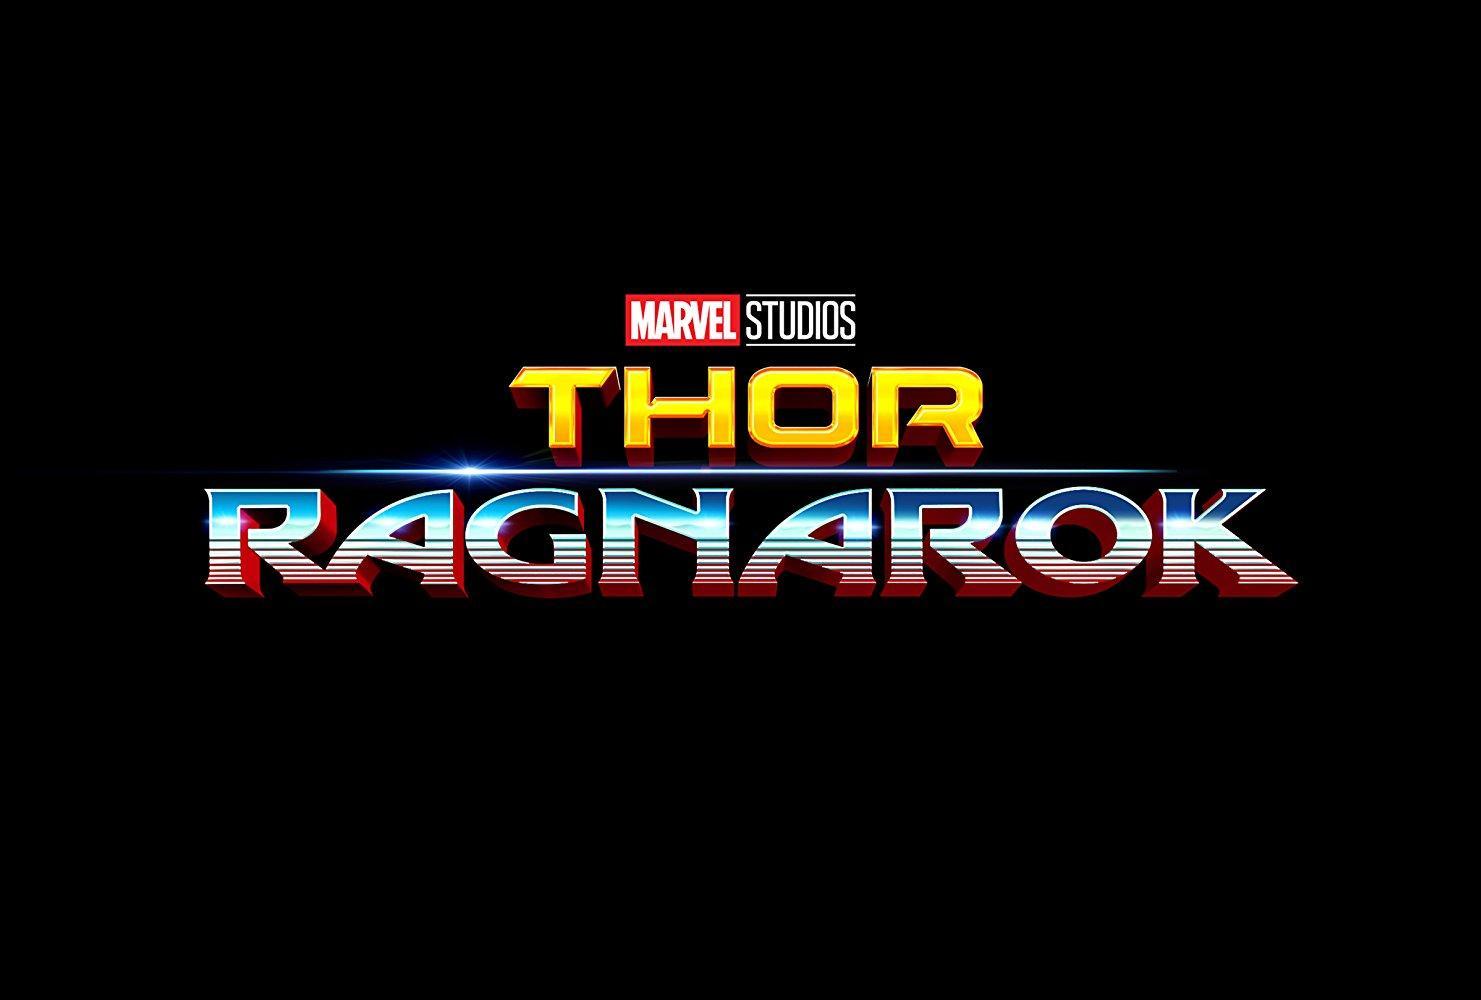 فيلم Thor: Ragnarok 2017 مترجم